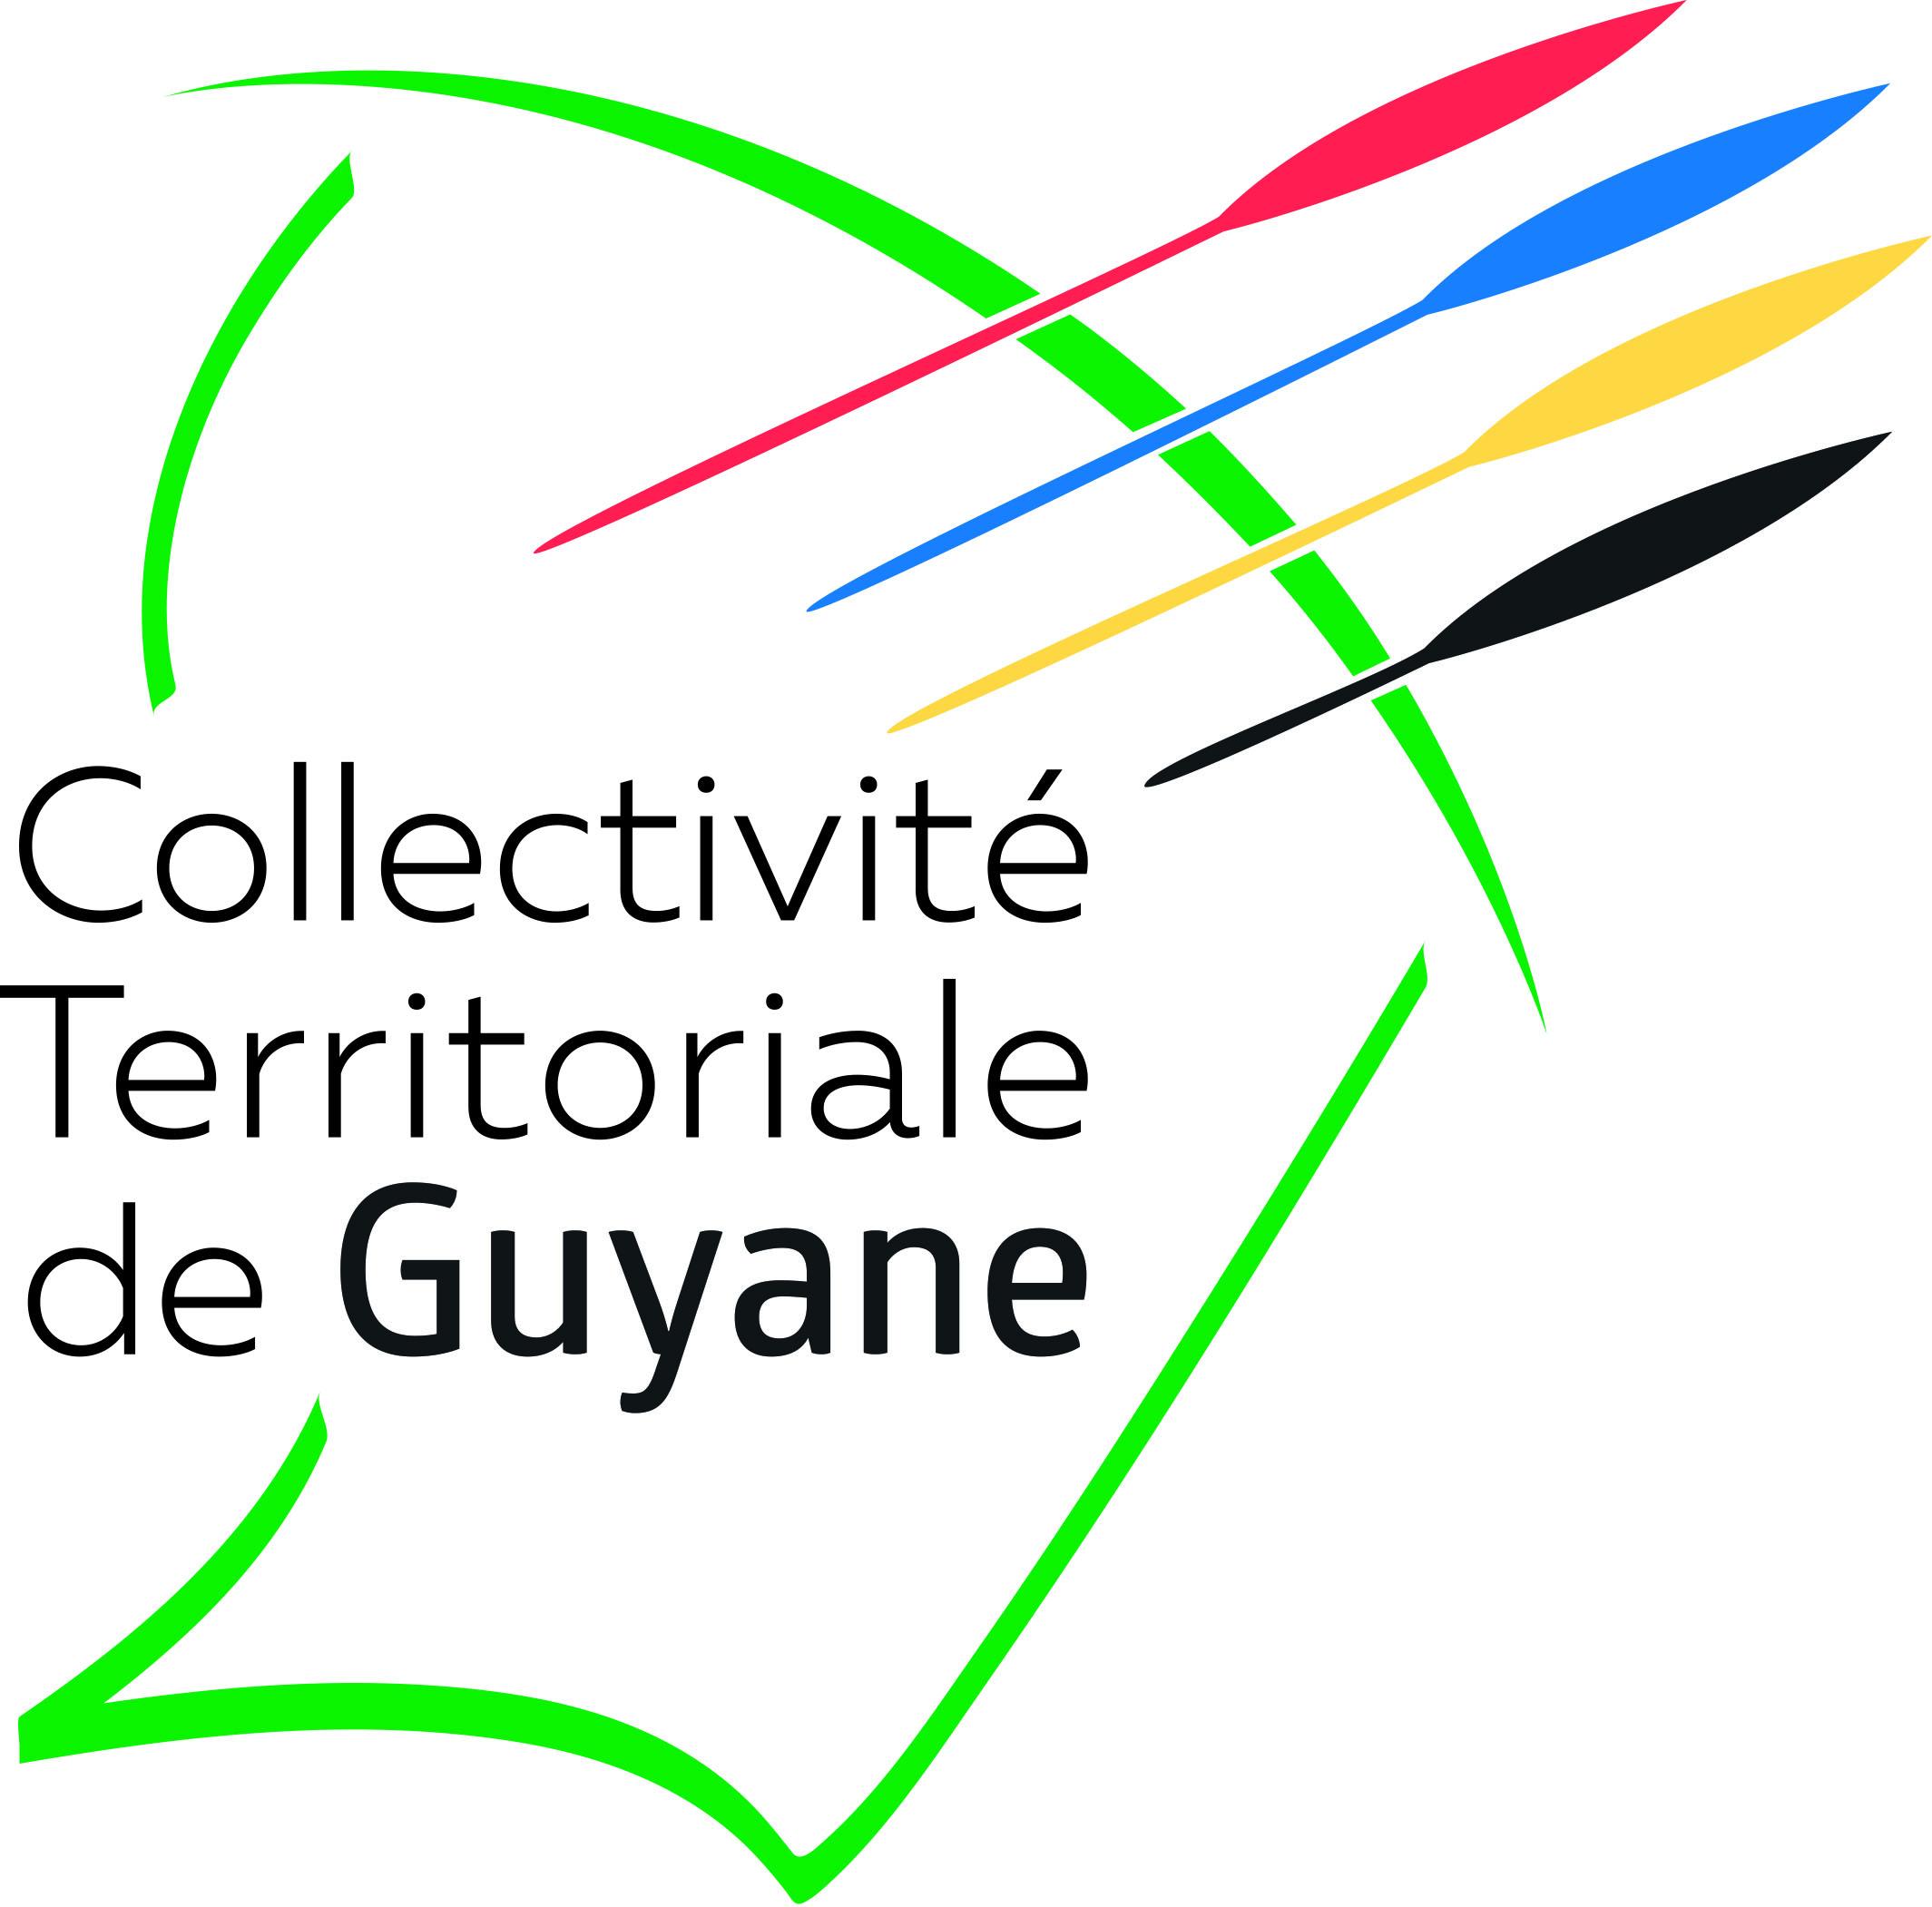 Collectivité Terriroriale de Guyane